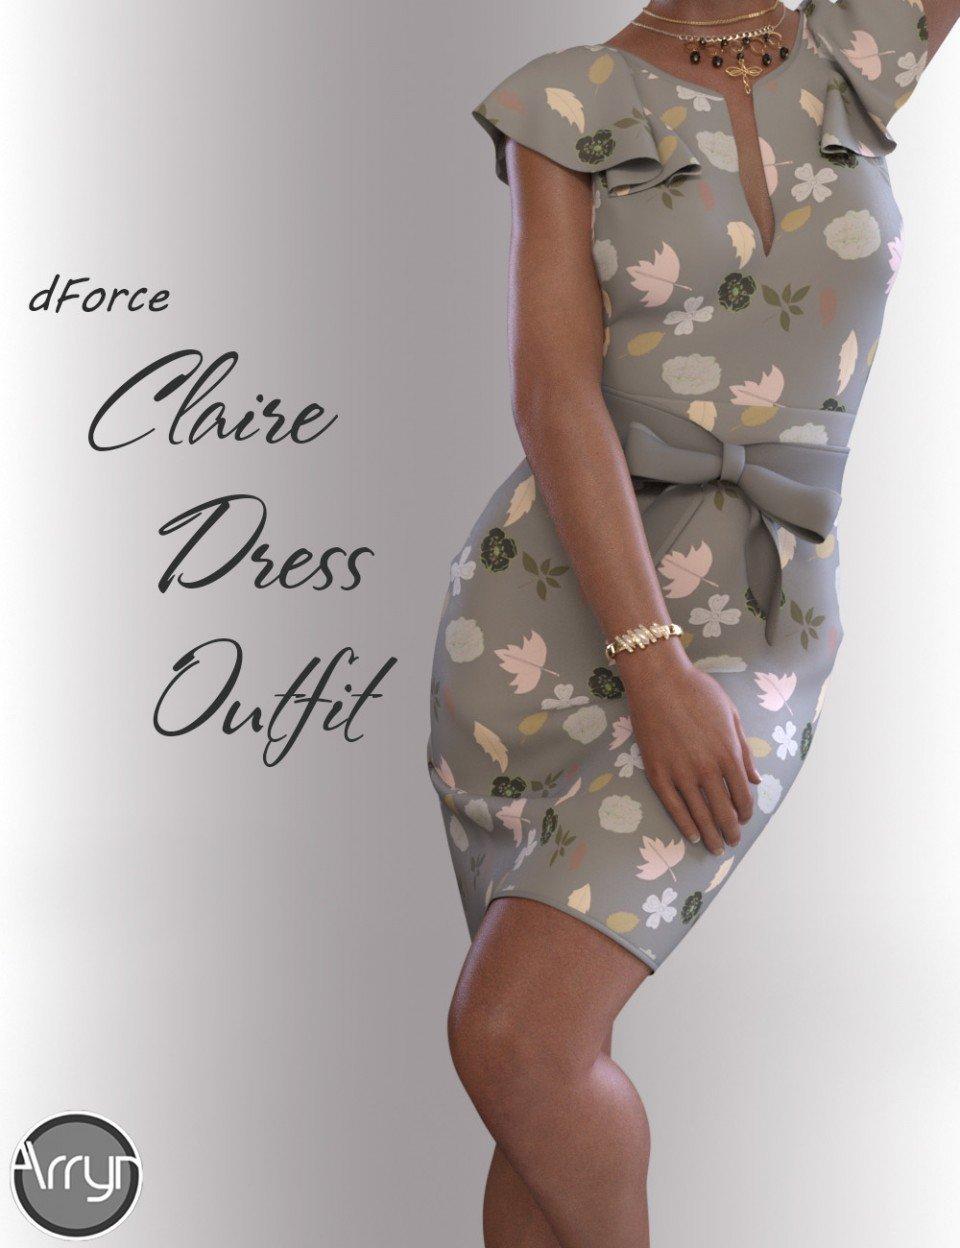 dForce Claire Cocktail Dress outfit for Genesis 8 Female(s)_DAZ3D下载站